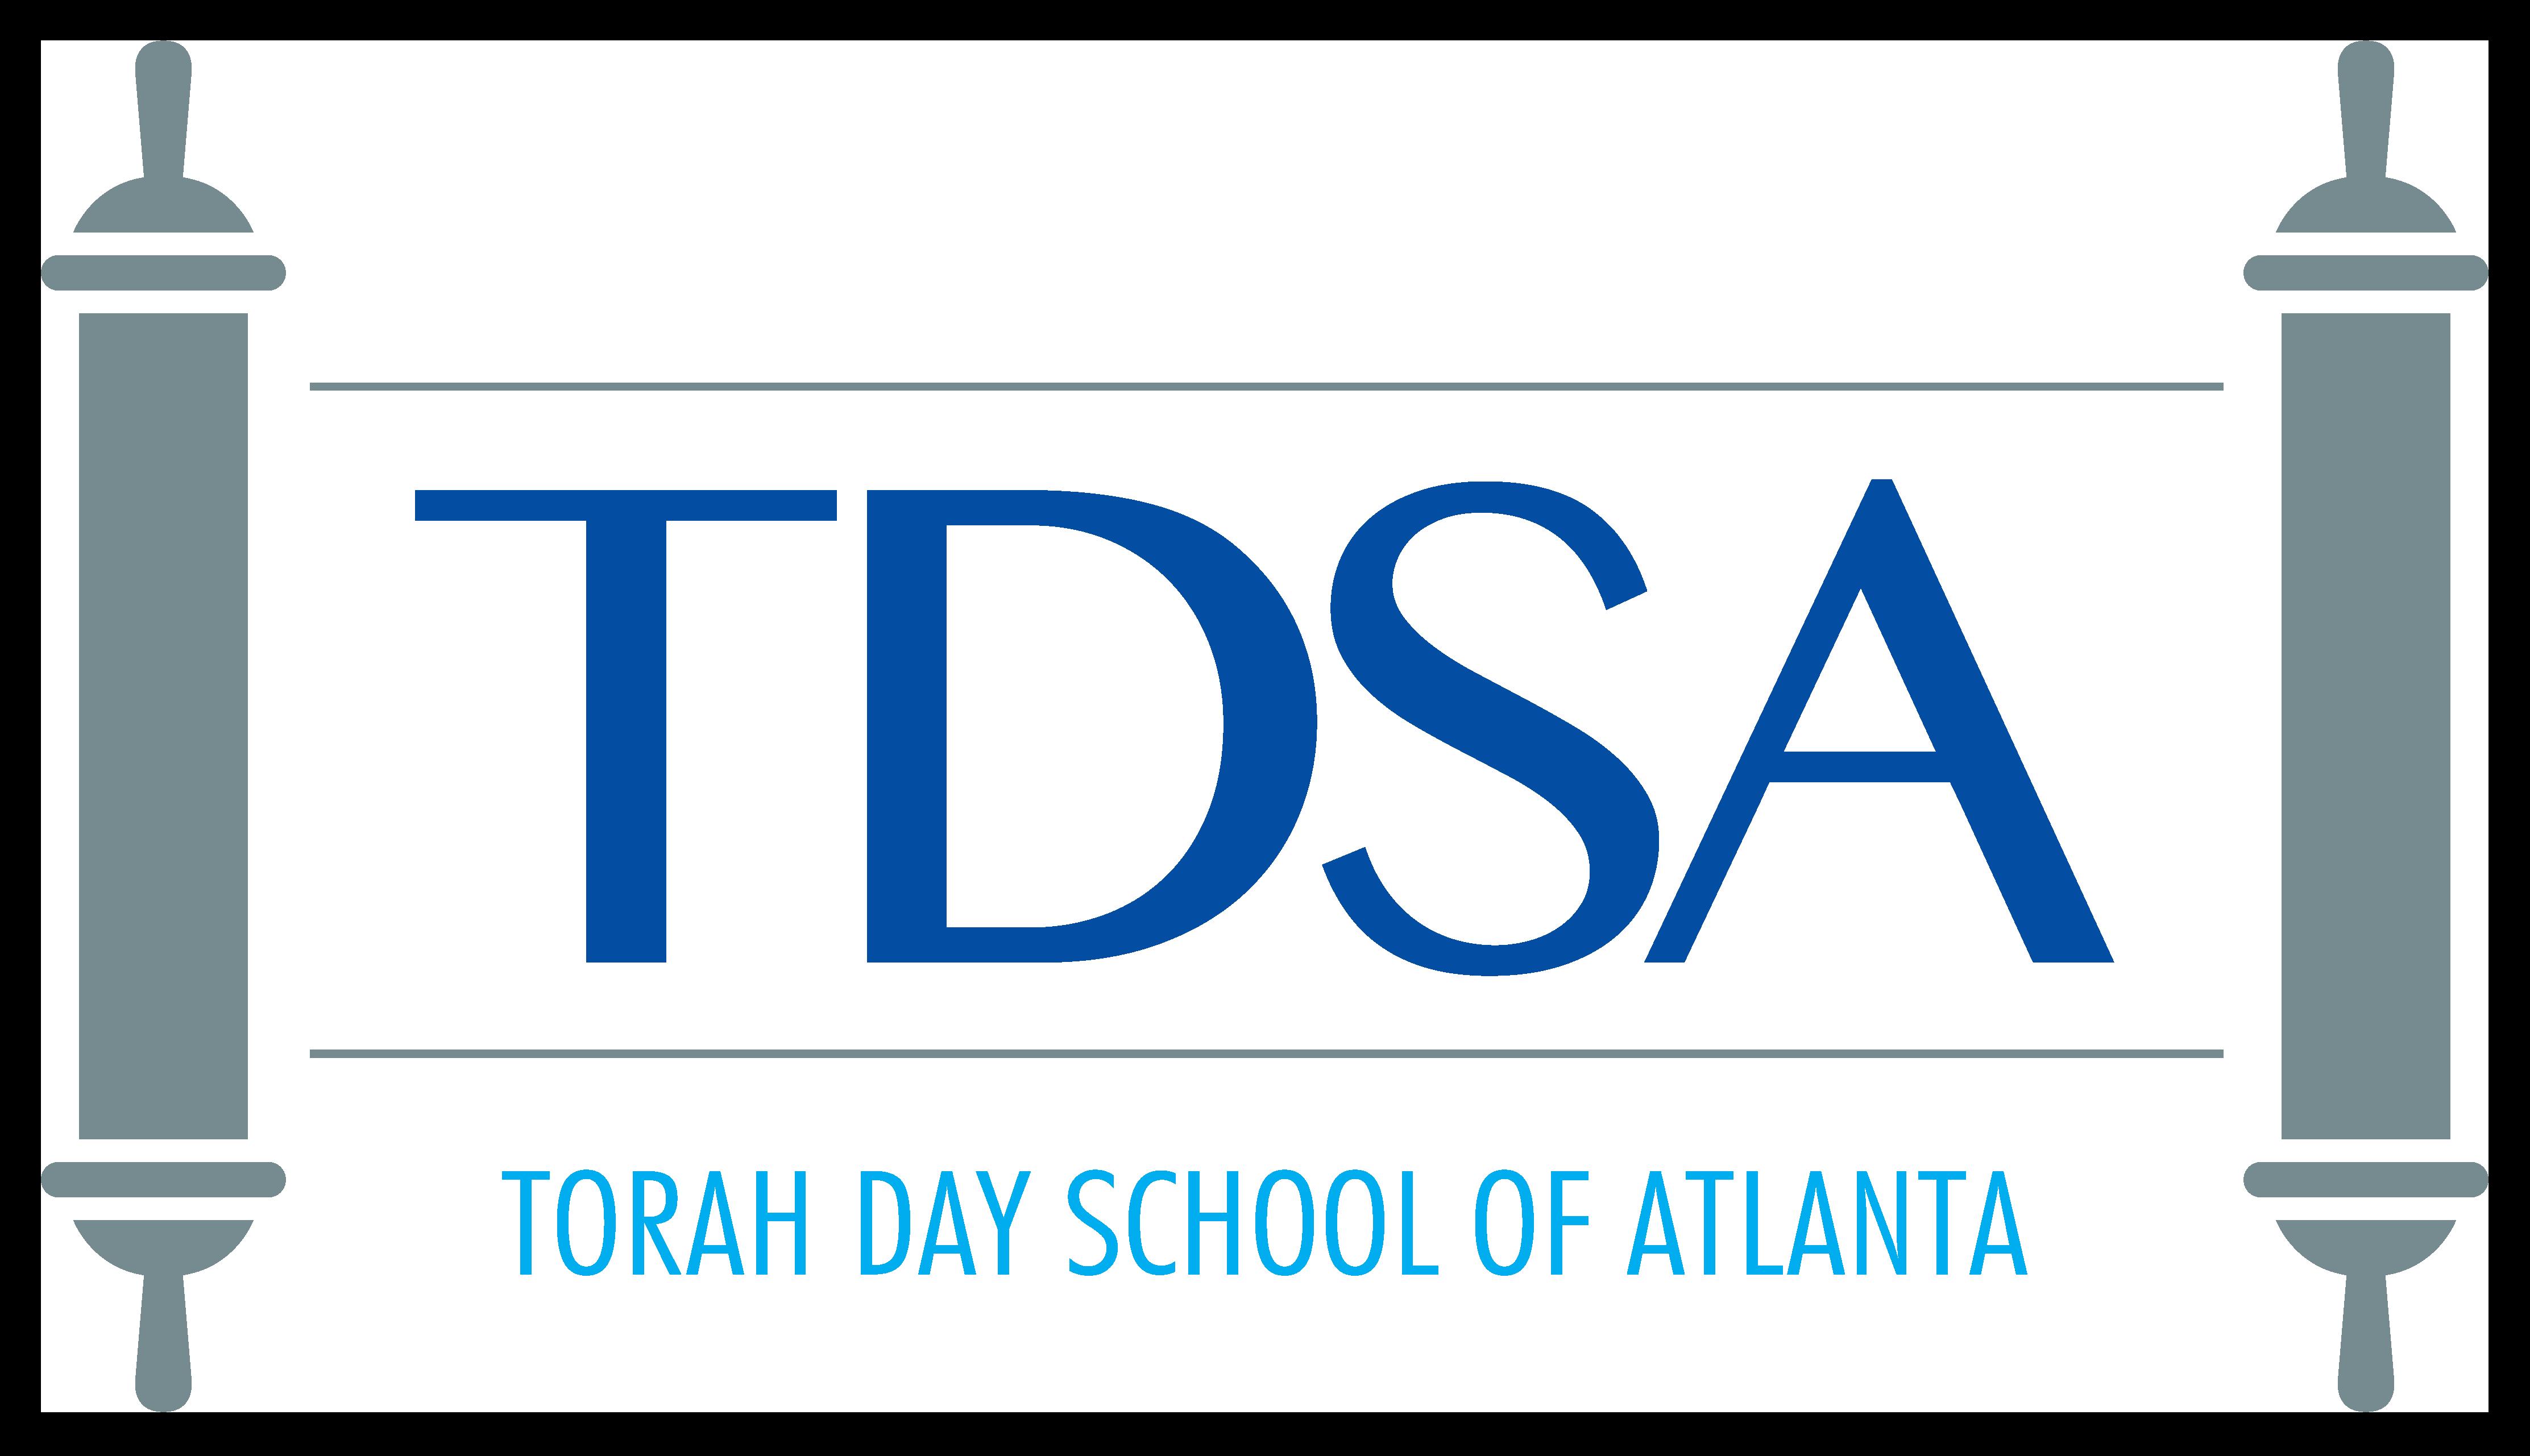 Torah Day School